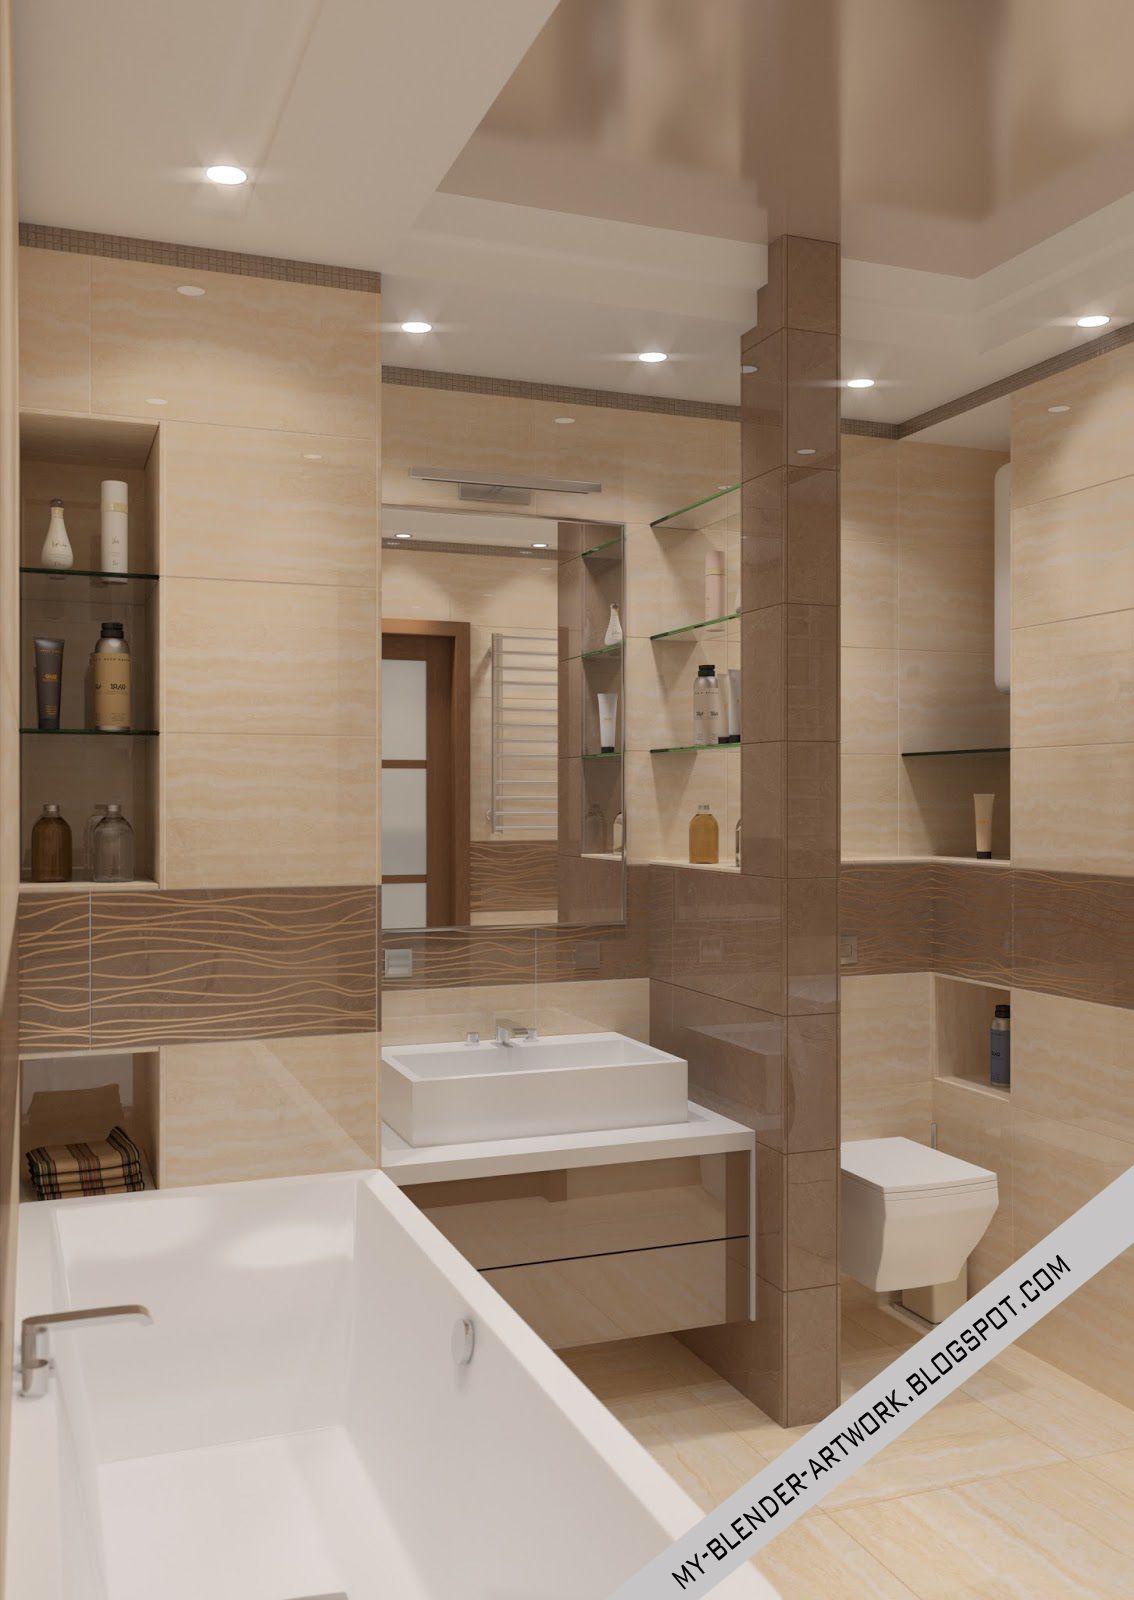 Bathroom Blender 3D interior render http://my-blender-artwork.blogspot.com